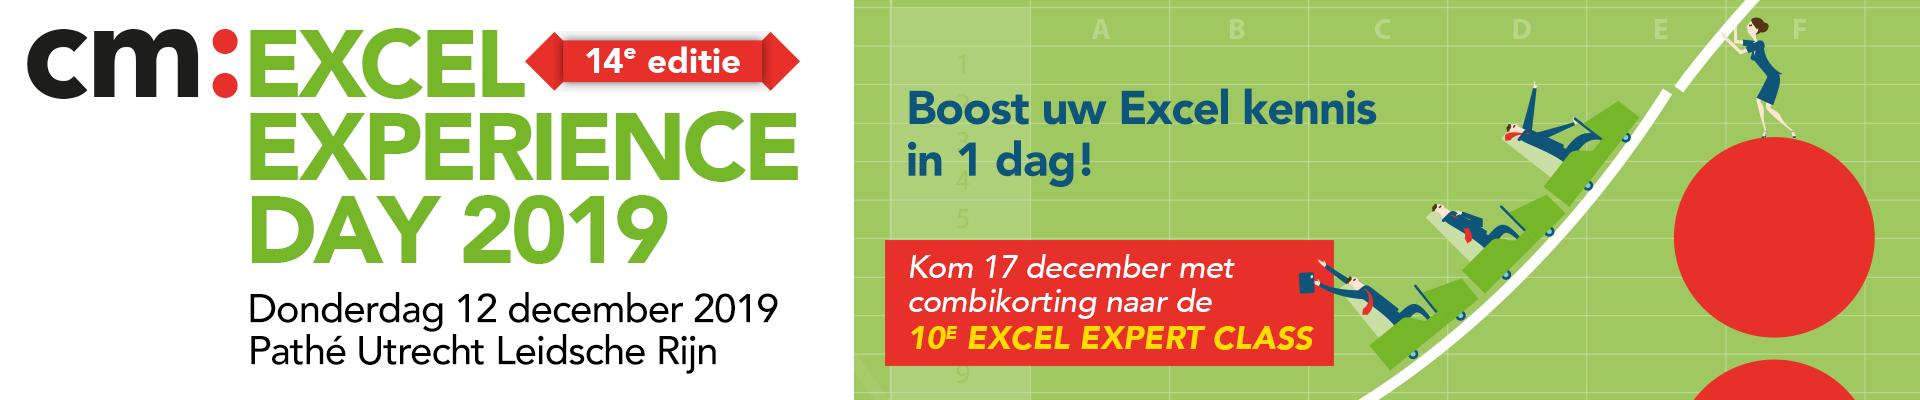 cm: Excel Experience Day en/of Excel Expert Class 2018